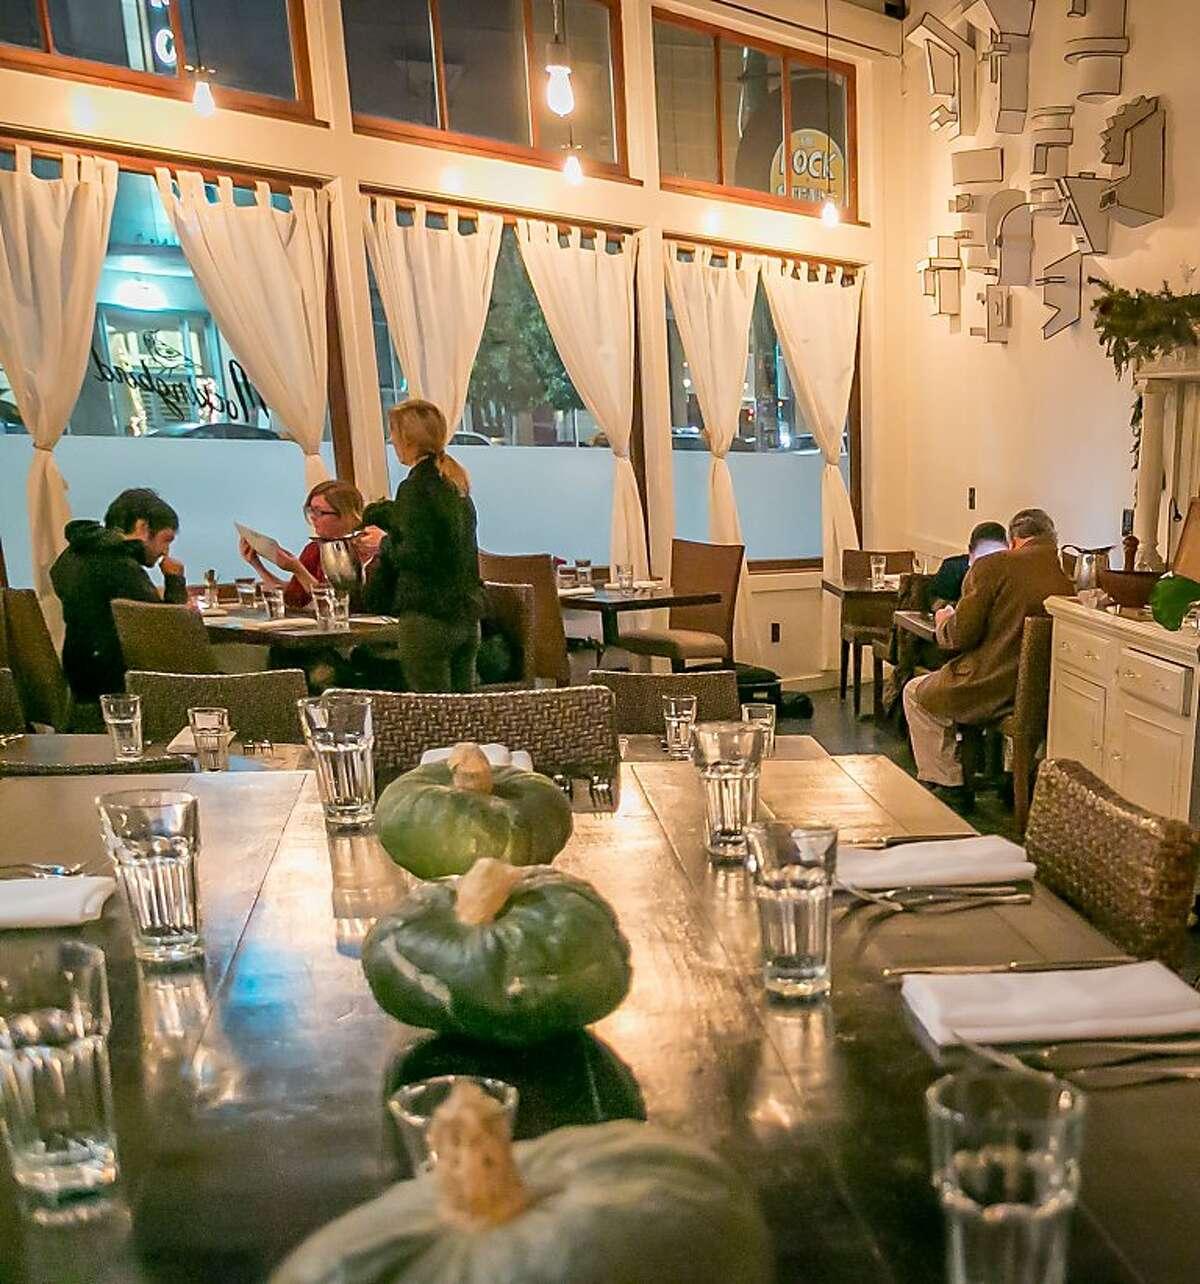 diners enjoy dinner at Mockingbird restaurant in Oakland, Calif., is seen on December 27th, 2013.